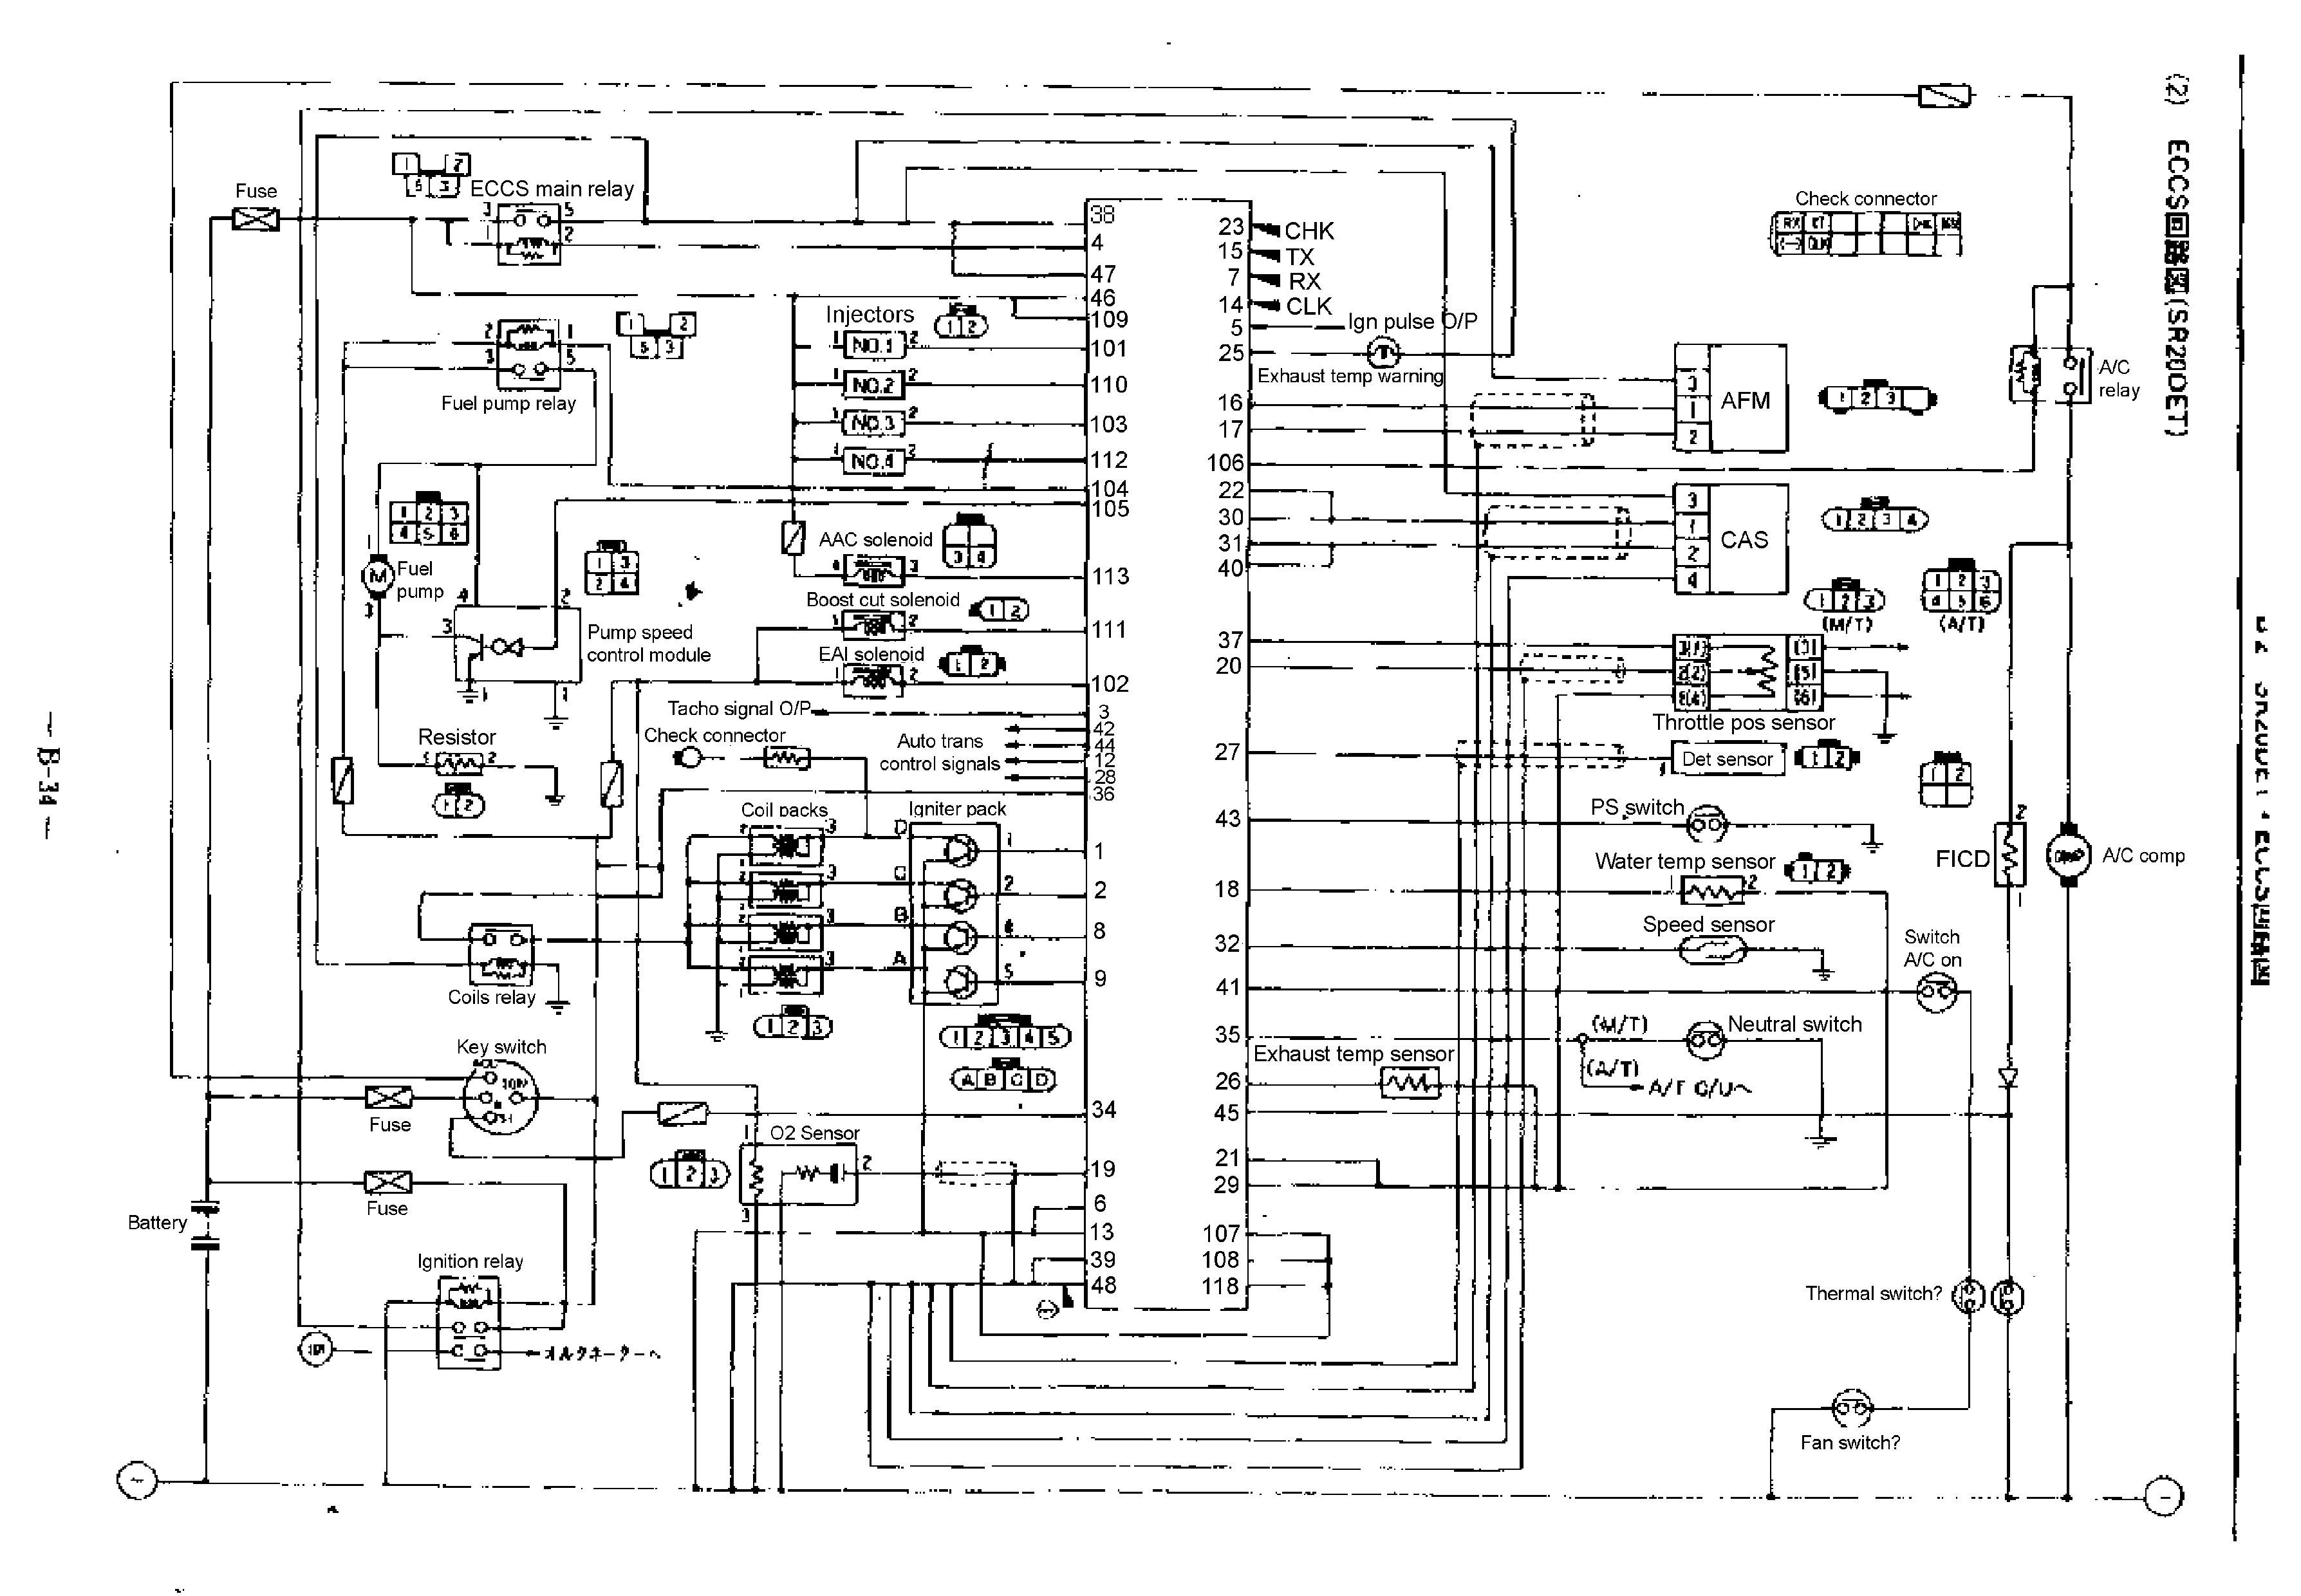 Autocar Truck Wiring DiagramsAuto Window Wiring Diagram